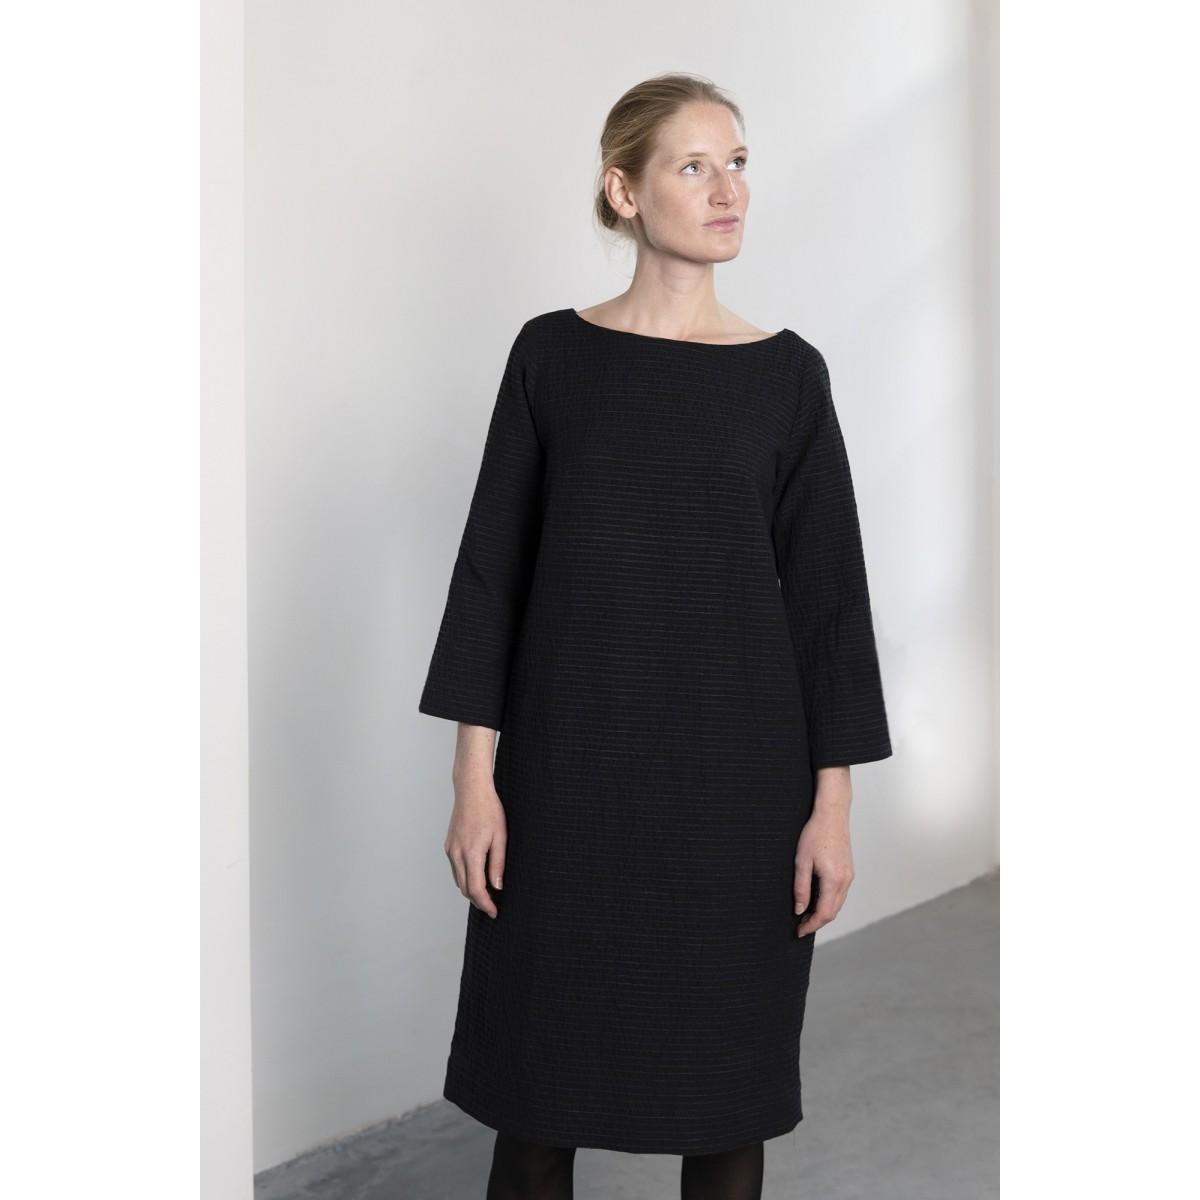 2ac872337e5dd7 Comfortabele jurk met zakken in prachtige streep / reliëf stof